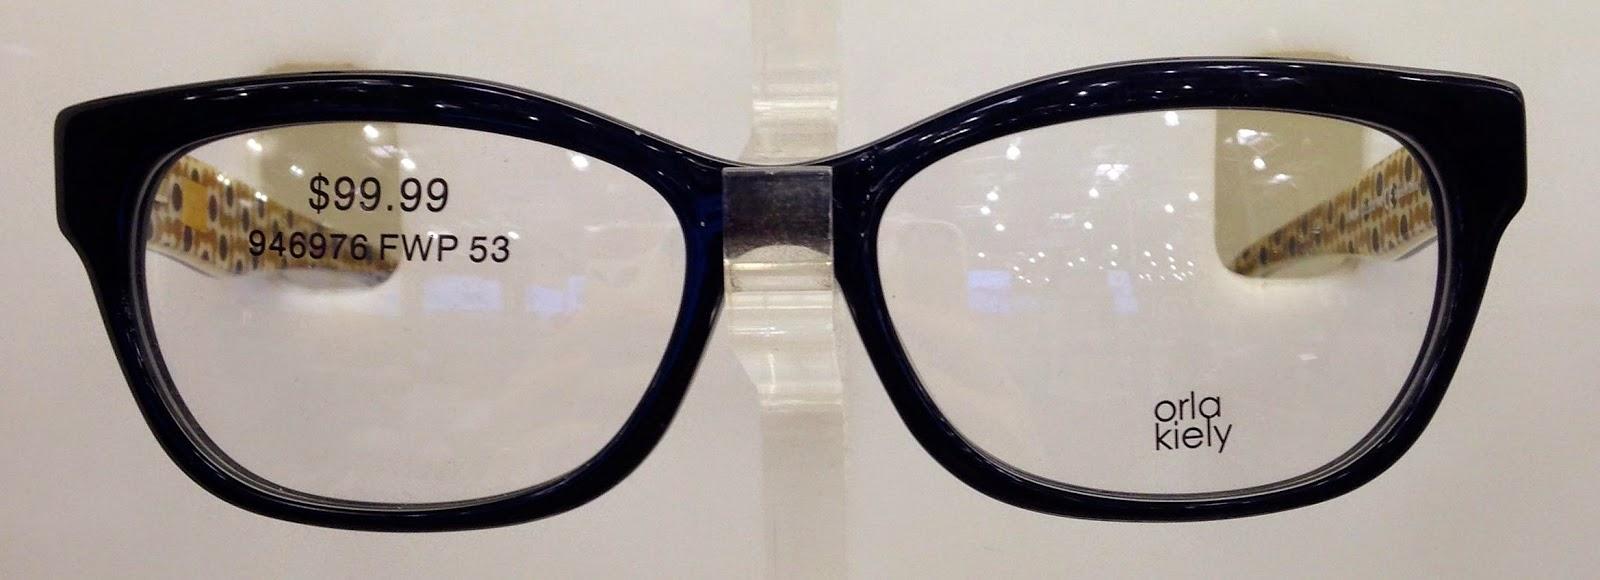 Eyeglass Frames Costco - Glasses Blog